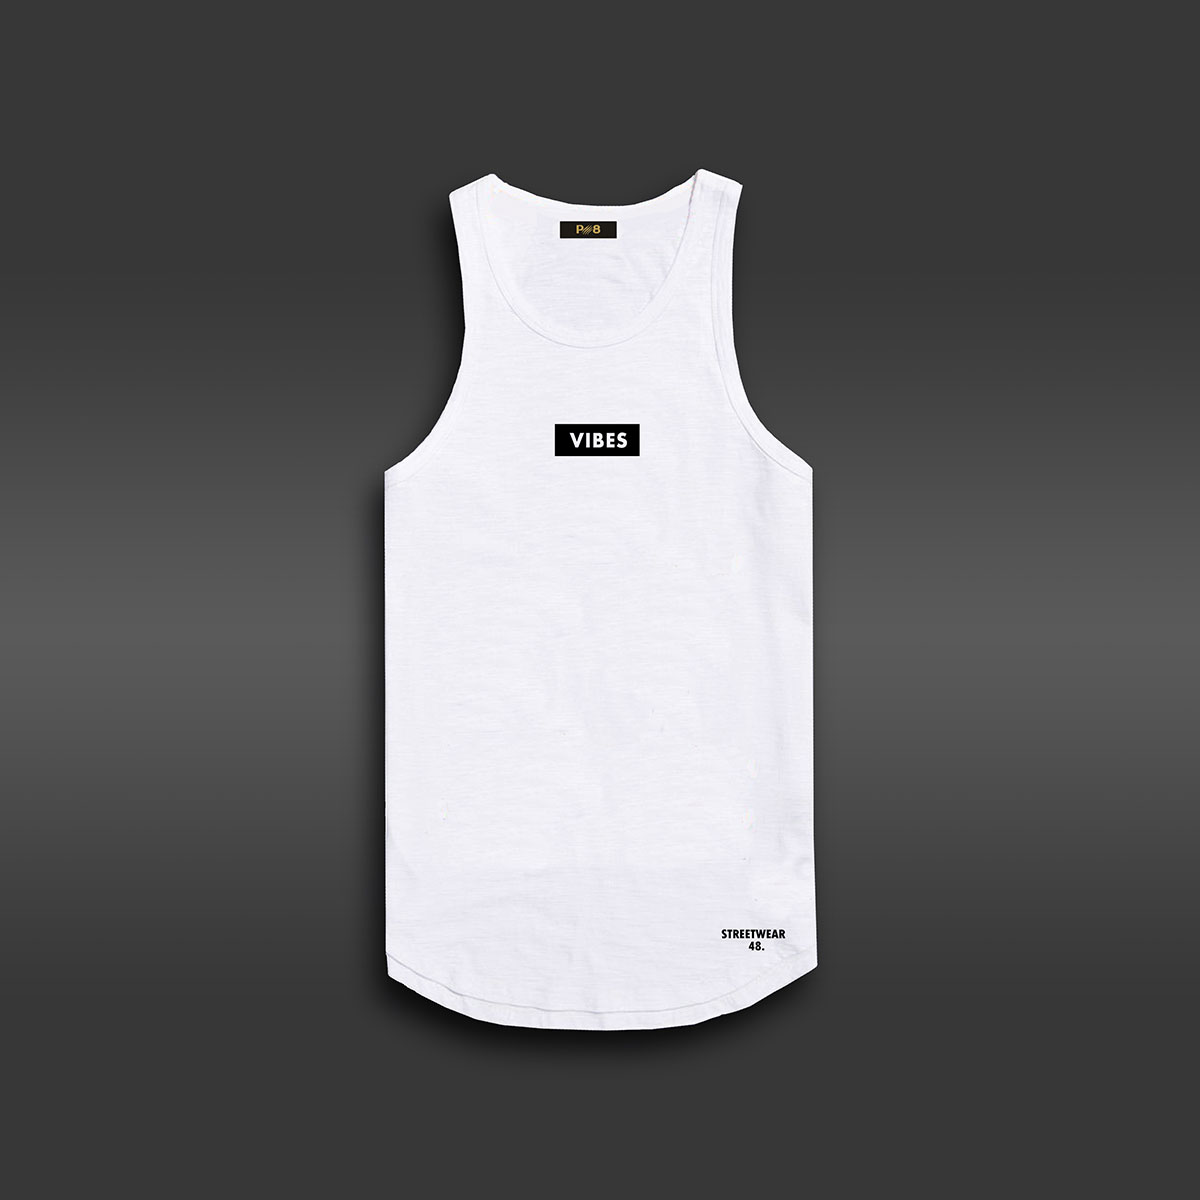 Vibes Tank-top - White